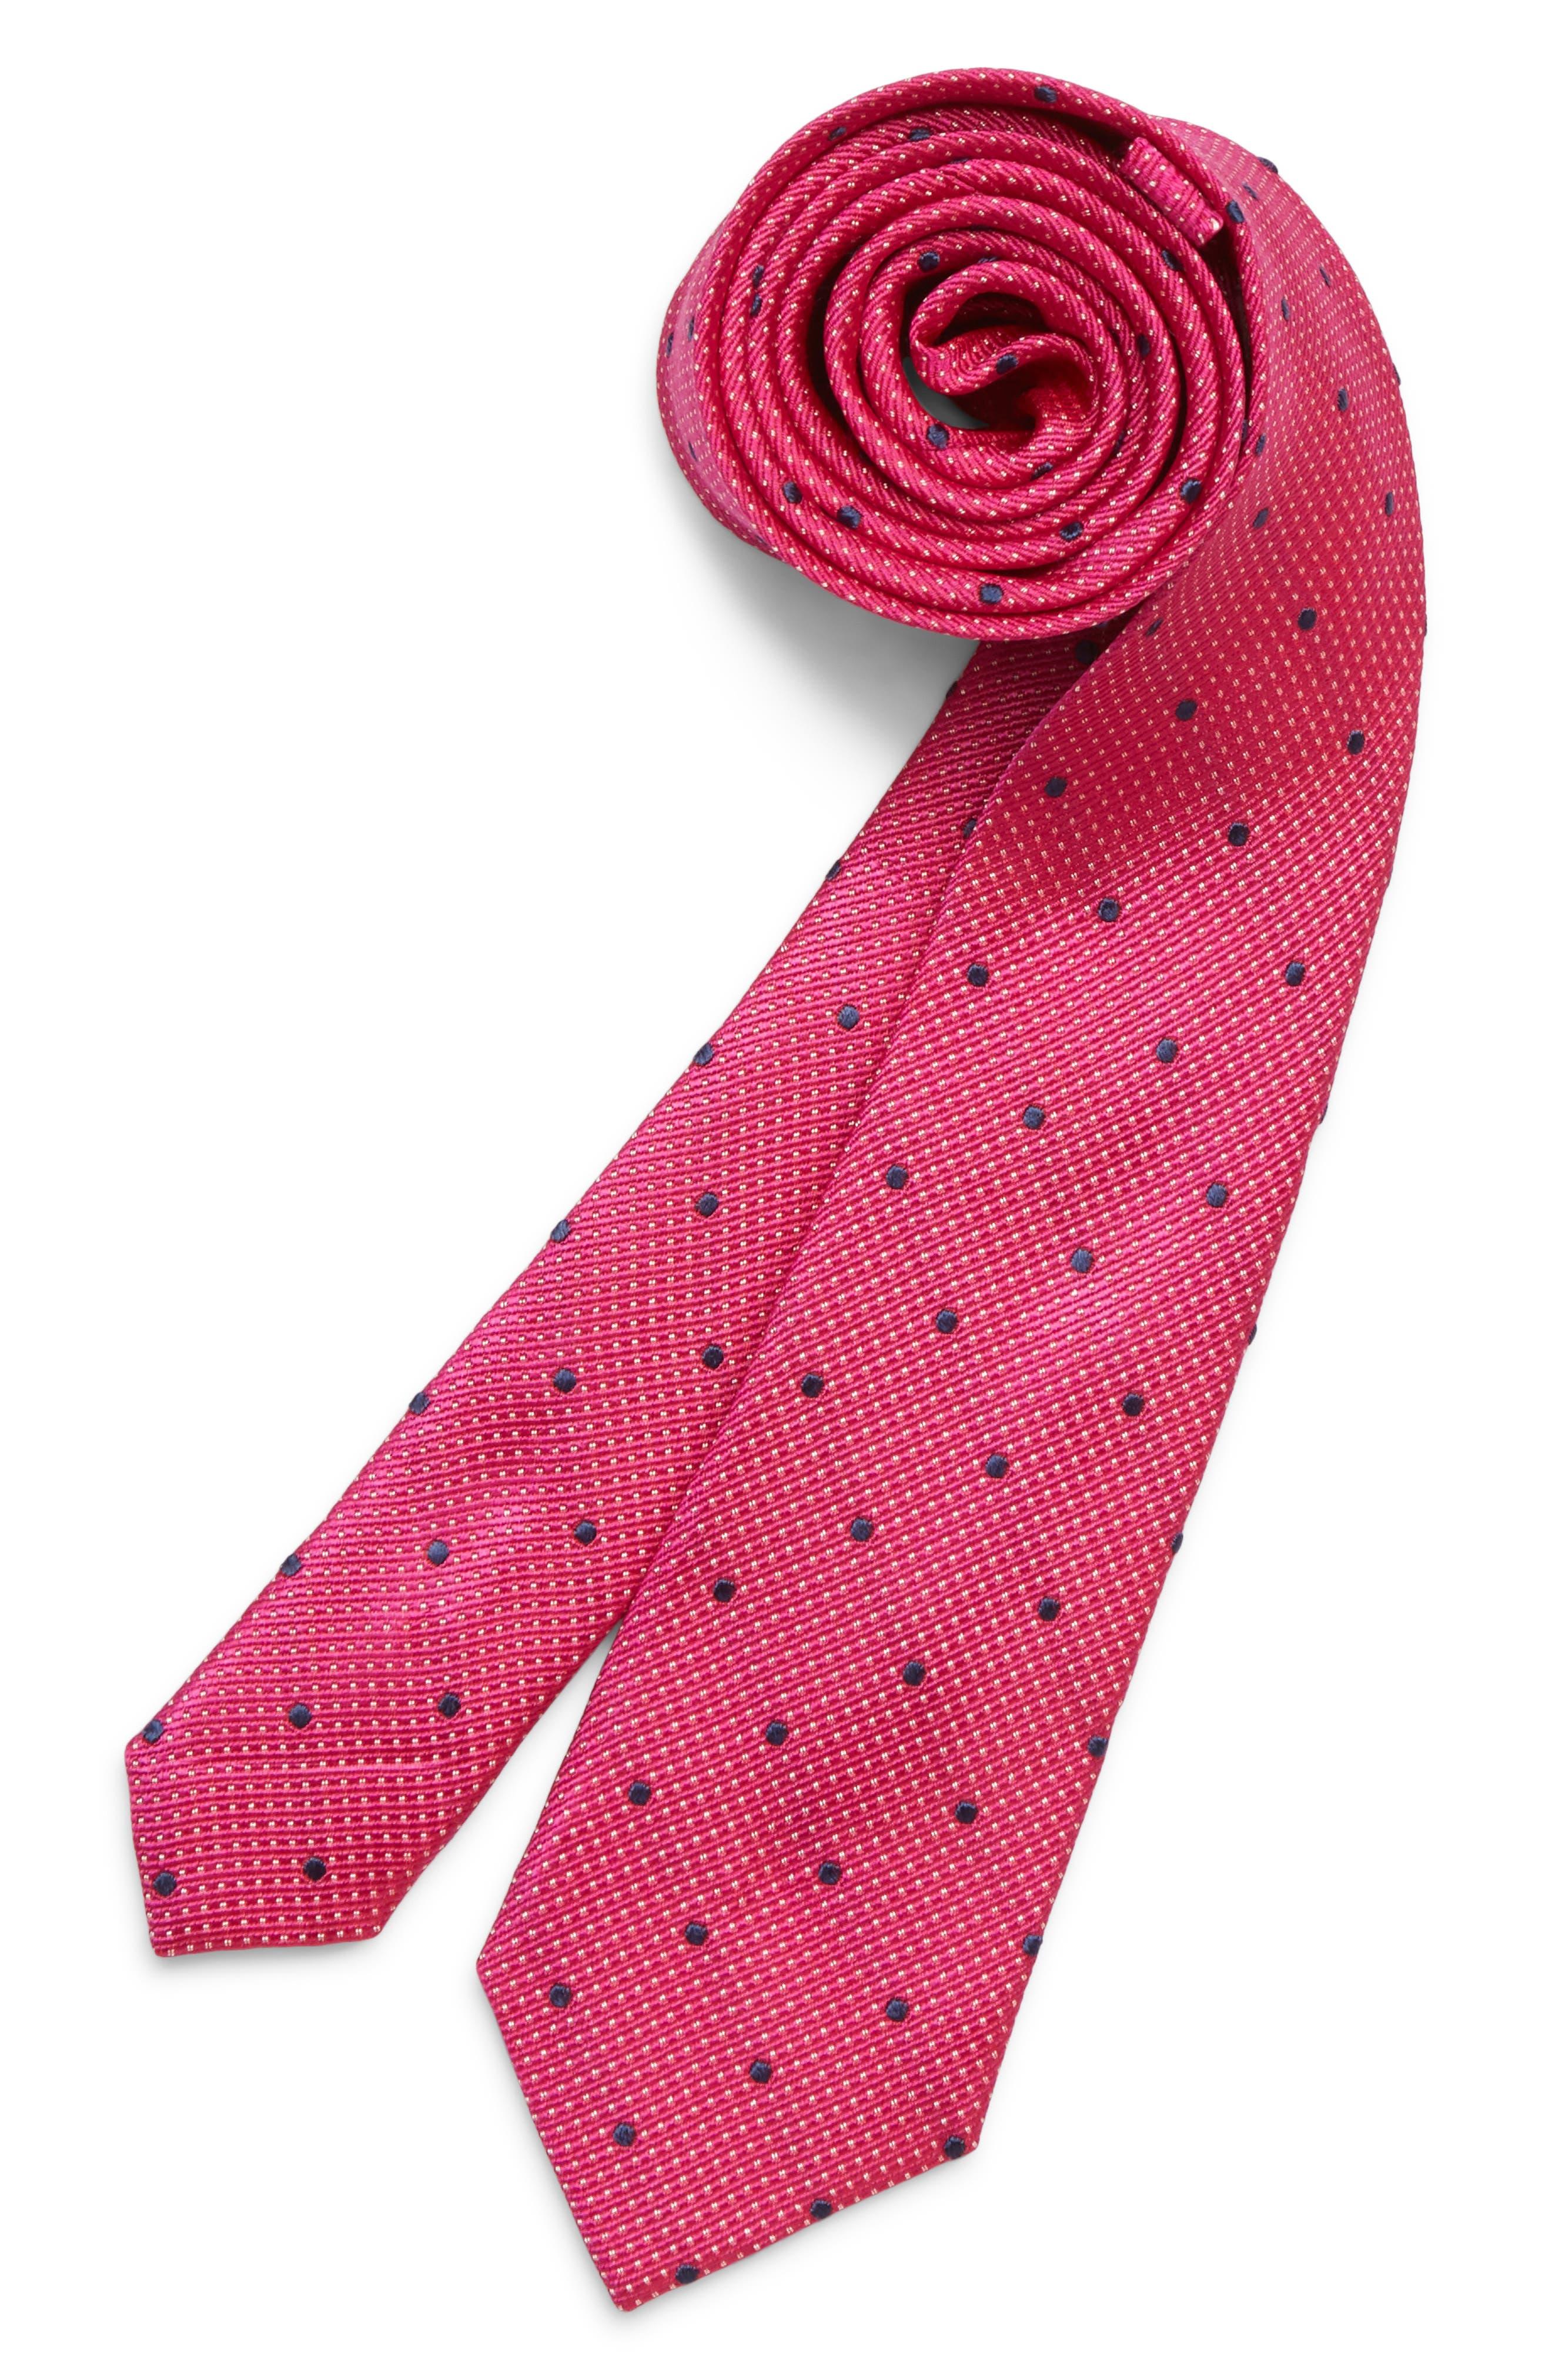 MICHAEL KORS,                             Dot Silk Tie,                             Main thumbnail 1, color,                             FUCHSIA